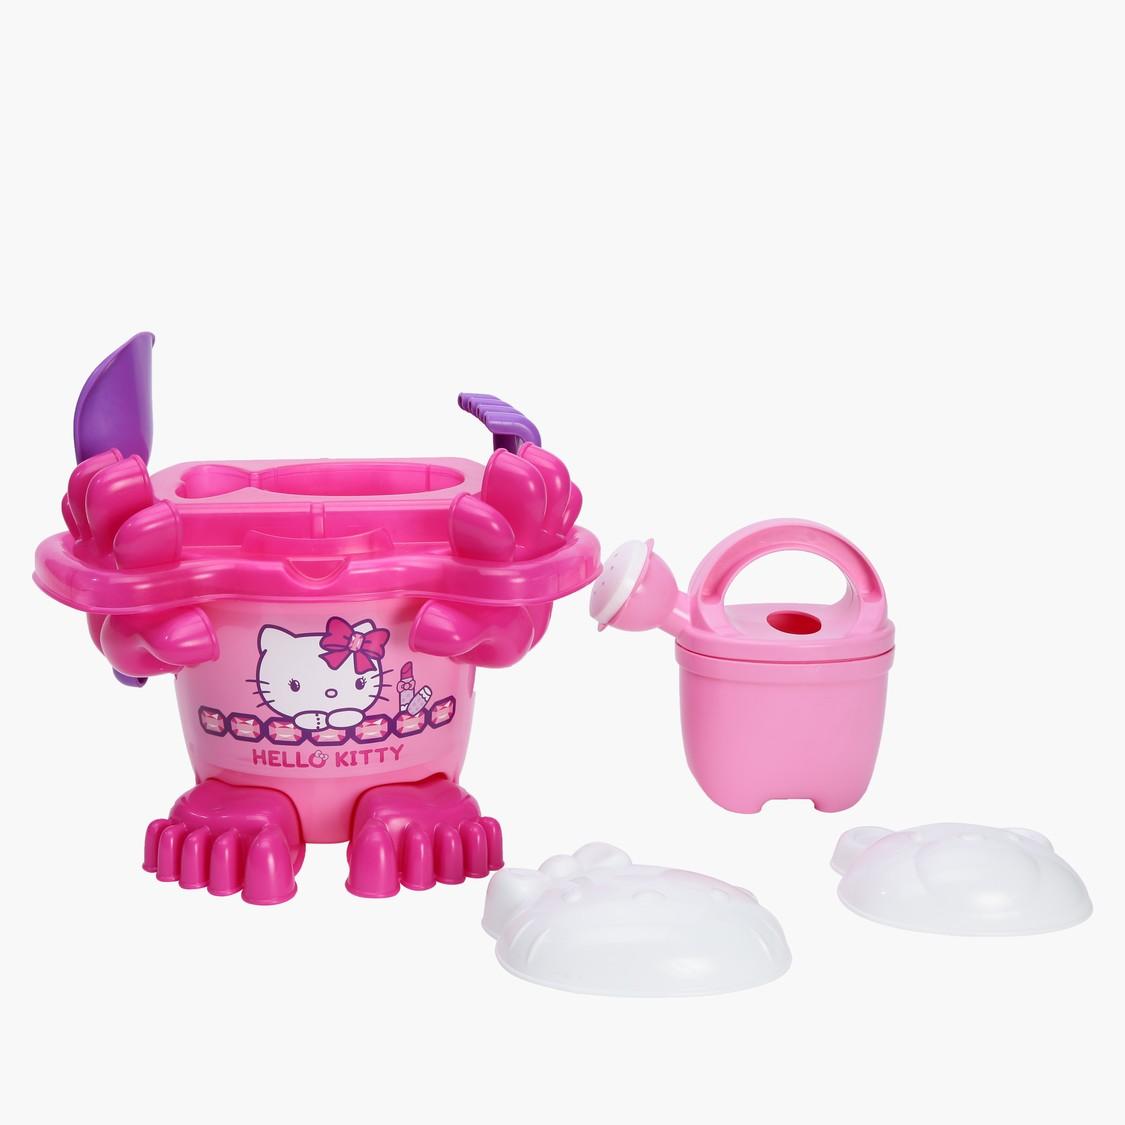 Hello Kitty Printed Sand Set